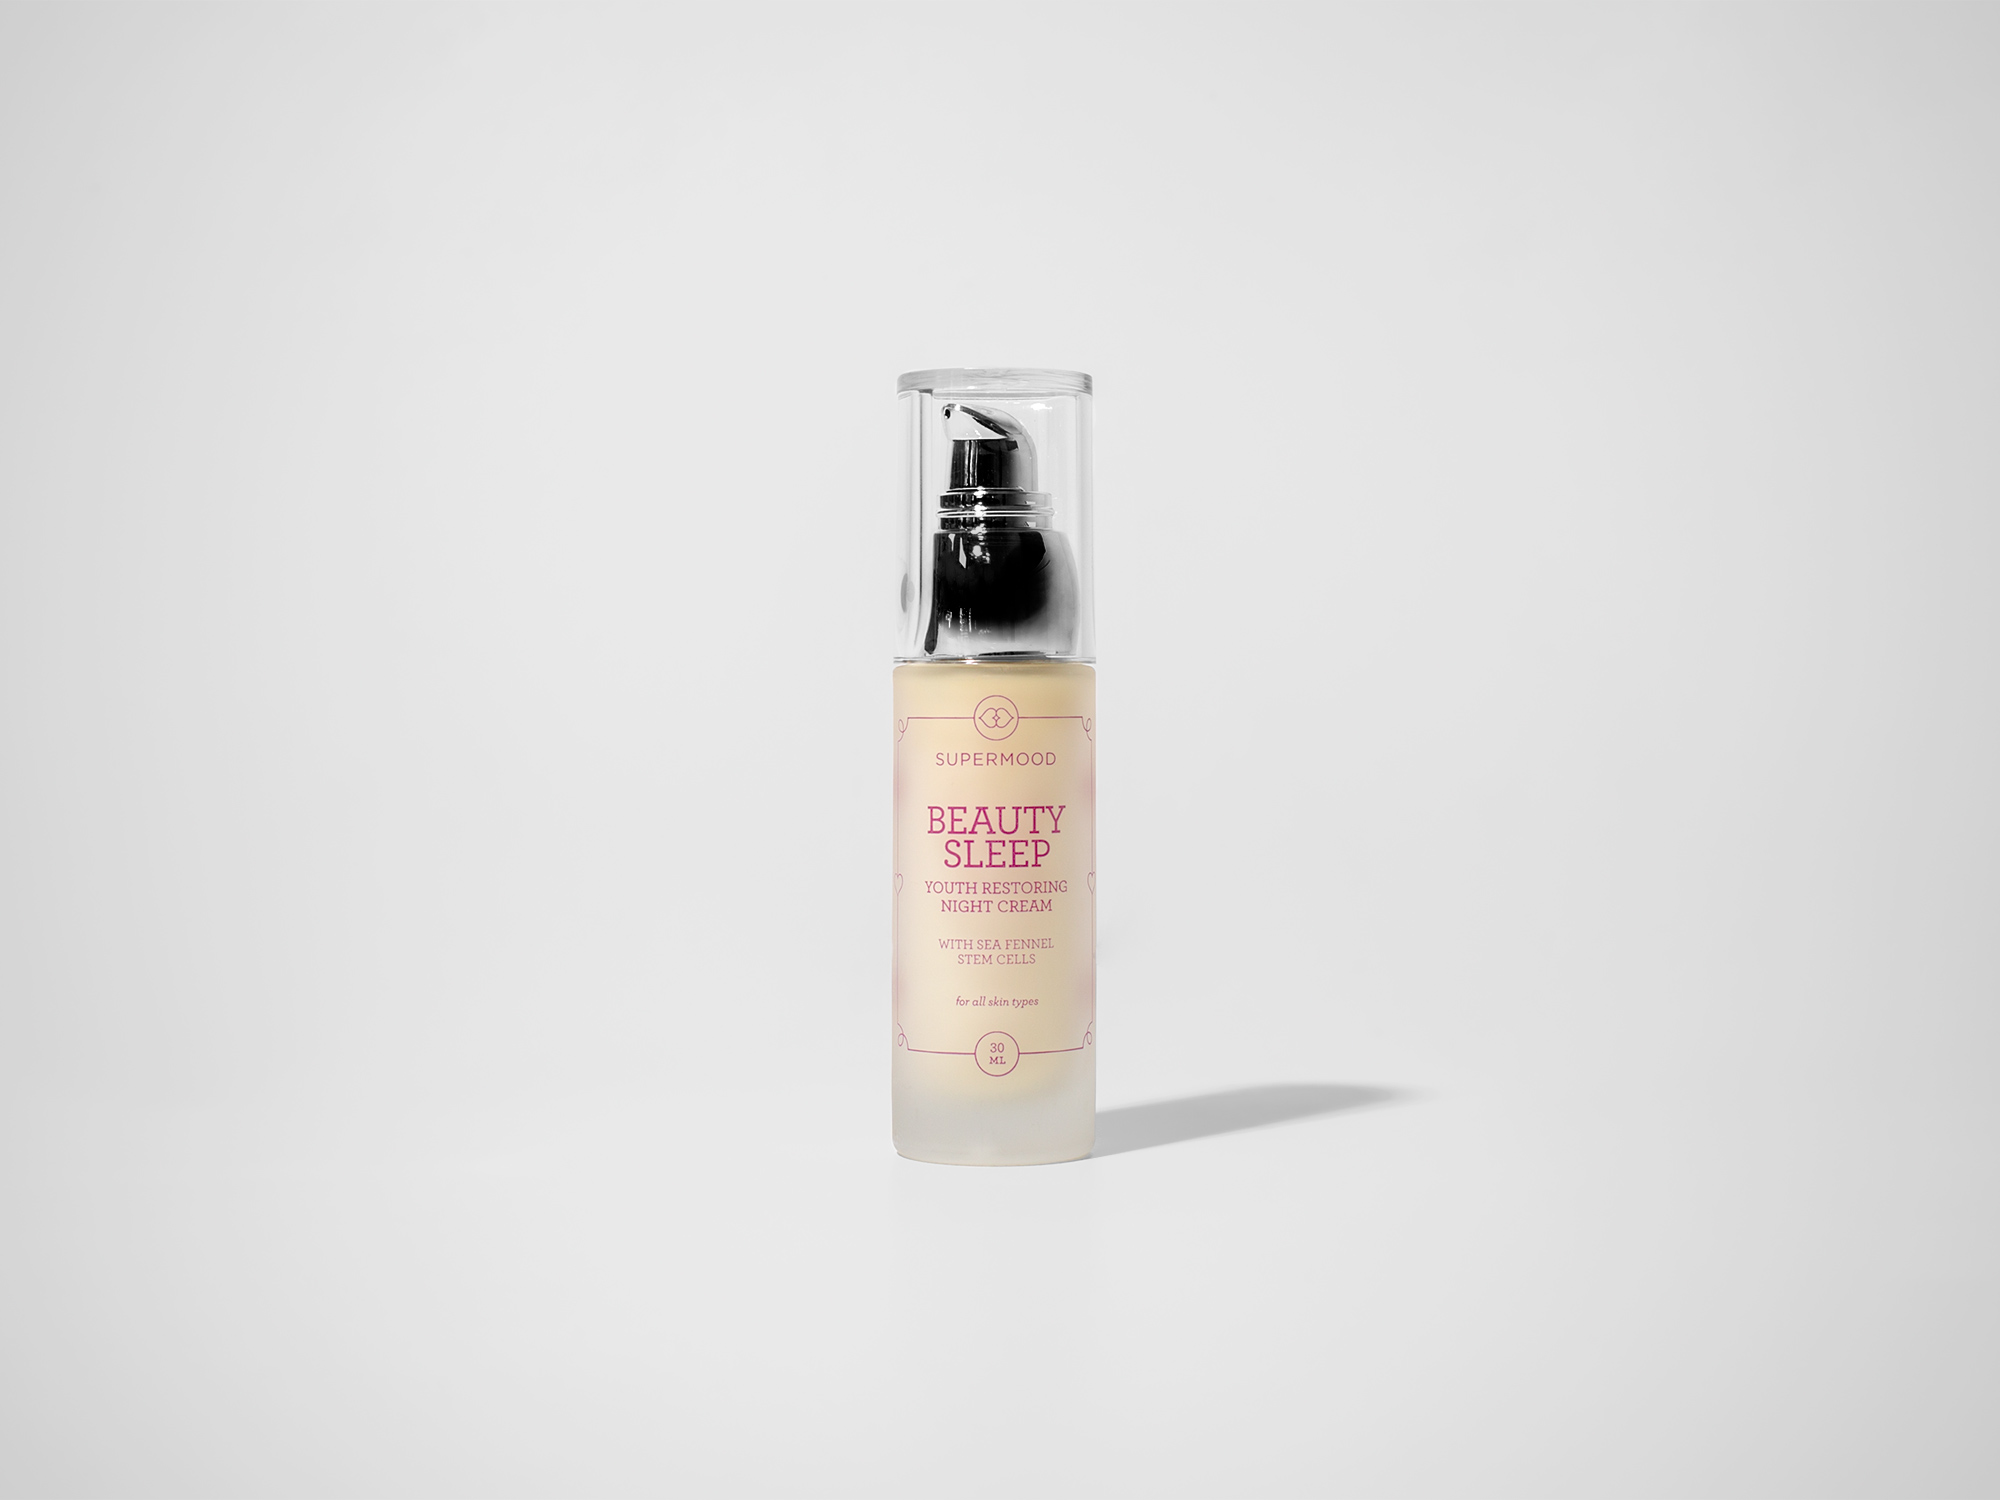 The-Skin-Supermood-Beauty-Sleep-Youth-Restoring-Night-Cream-30ml.jpg